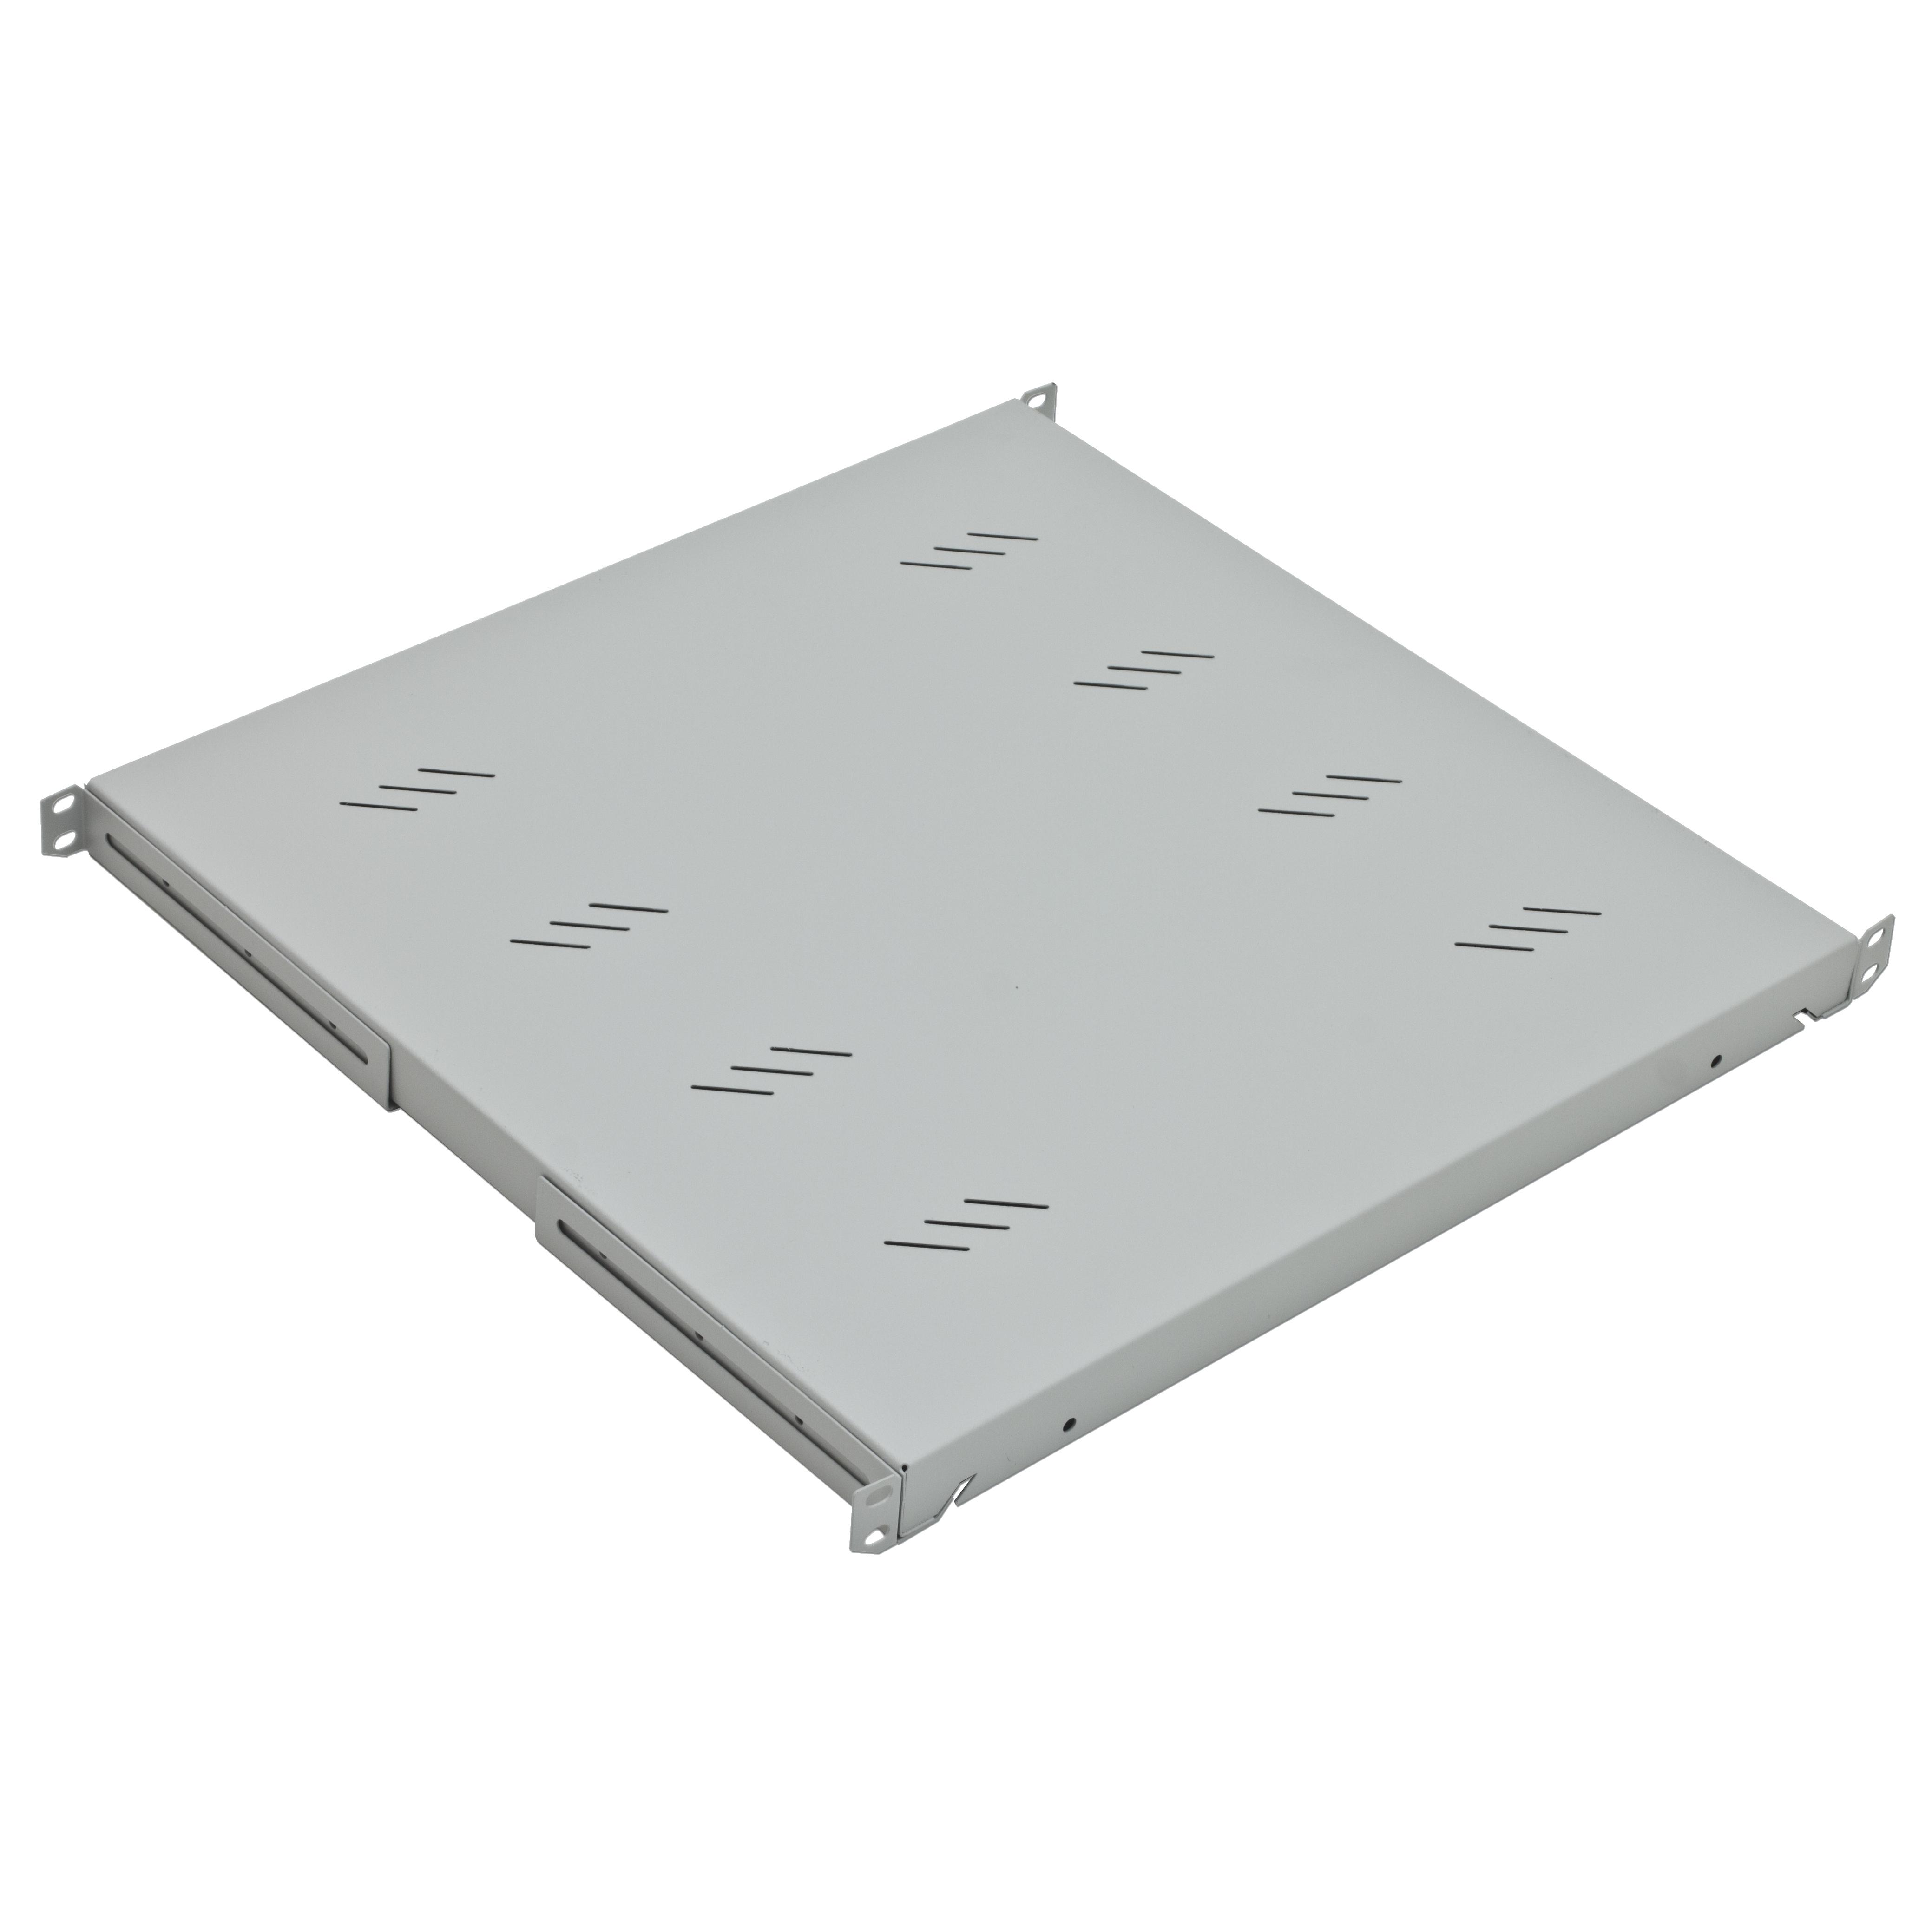 1 Stk 19 Fachboden Fix, bis 80kg Last, T=950mm, 1HE, RAL7035 DFS14895-C